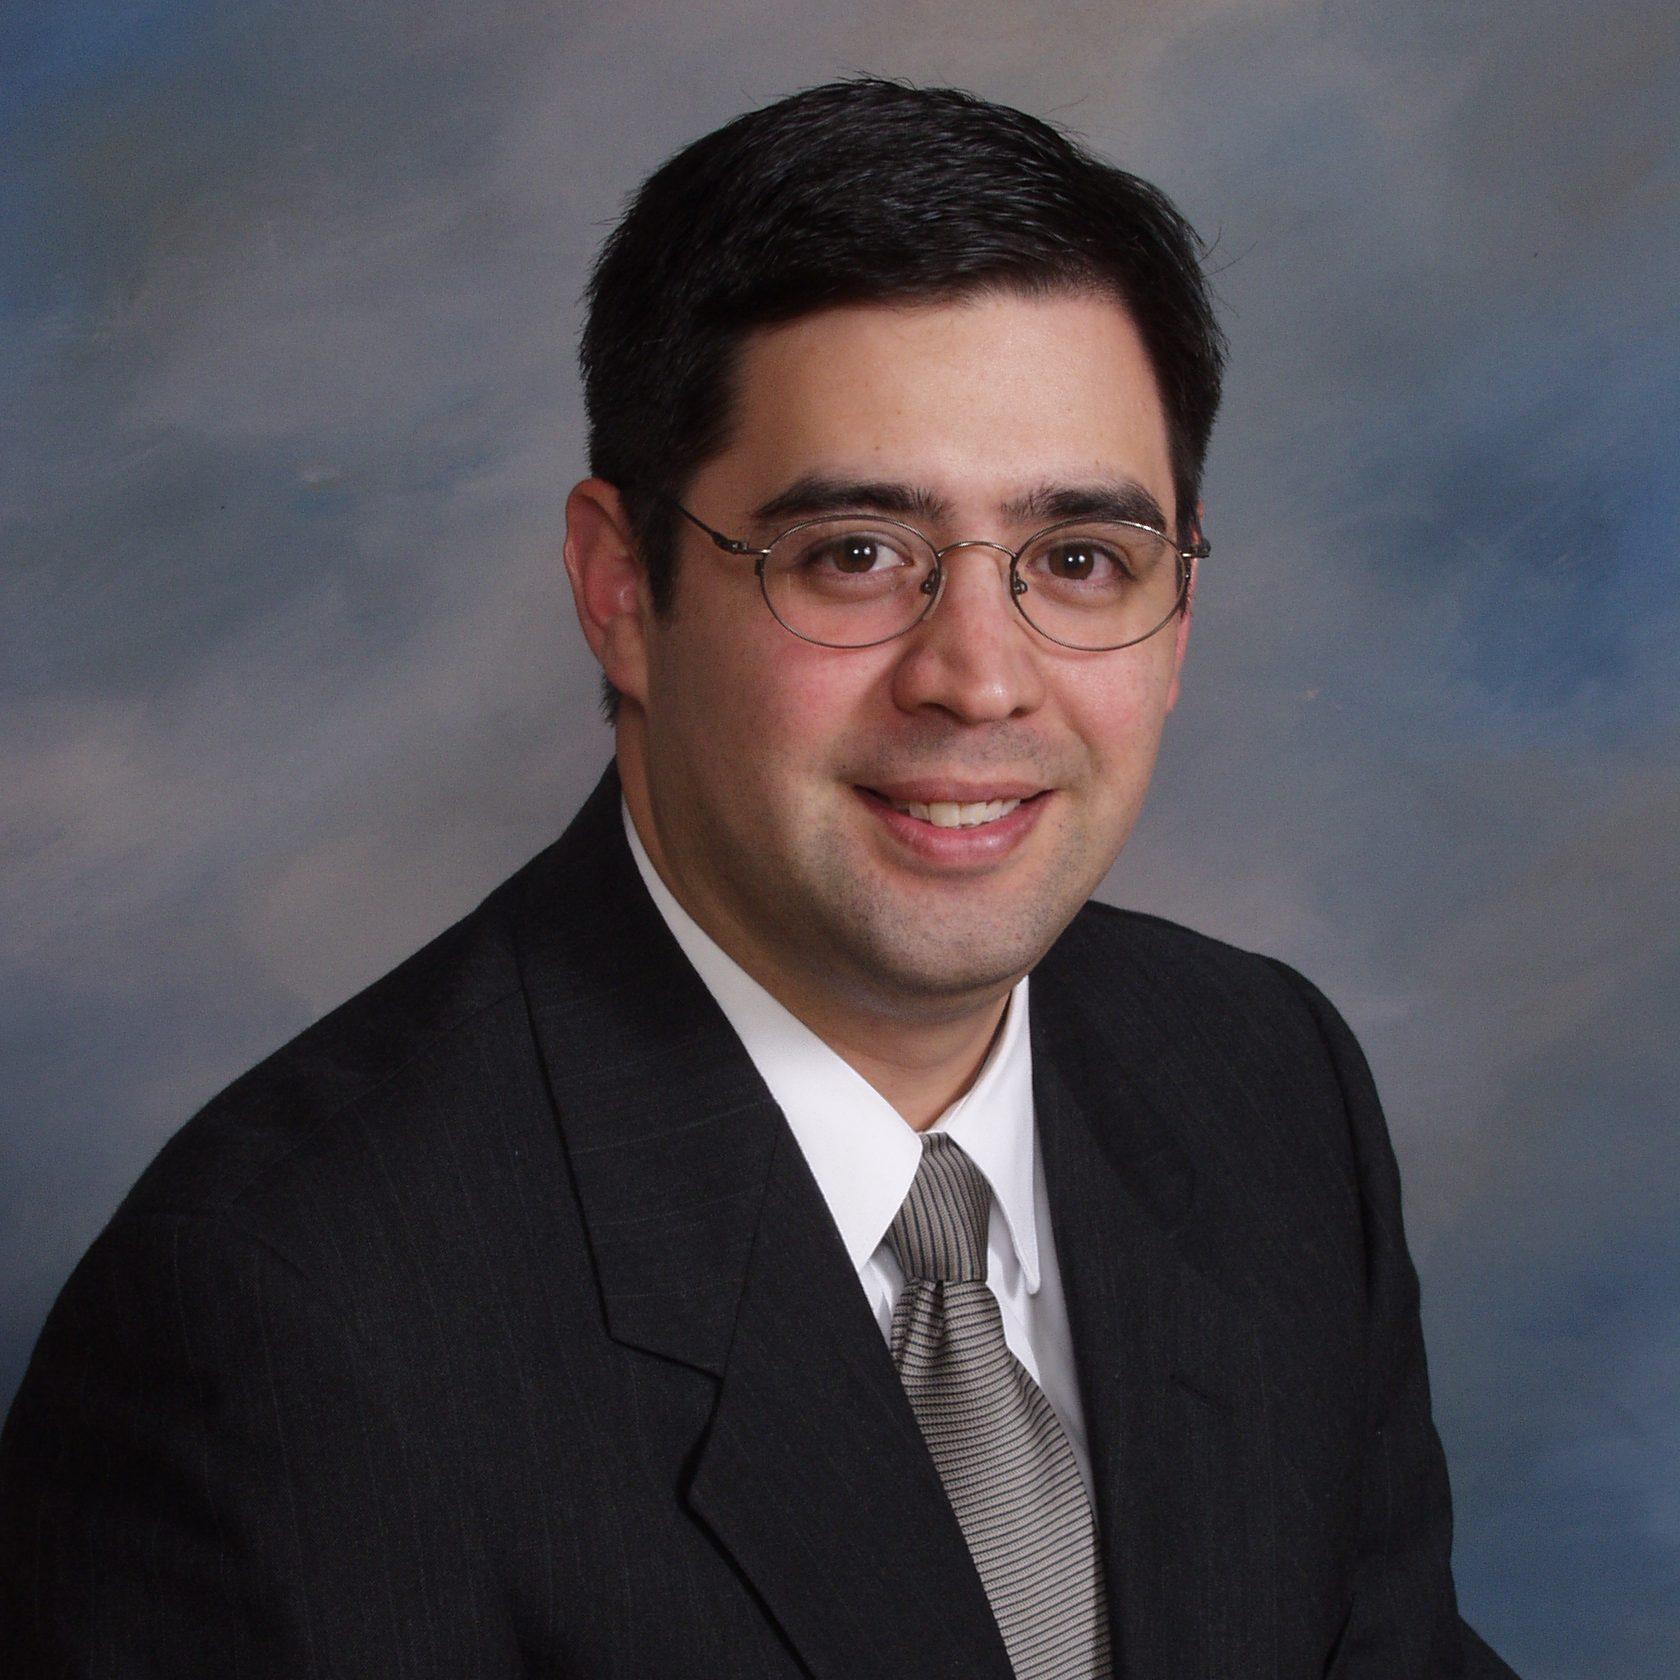 Stephen P. Bega